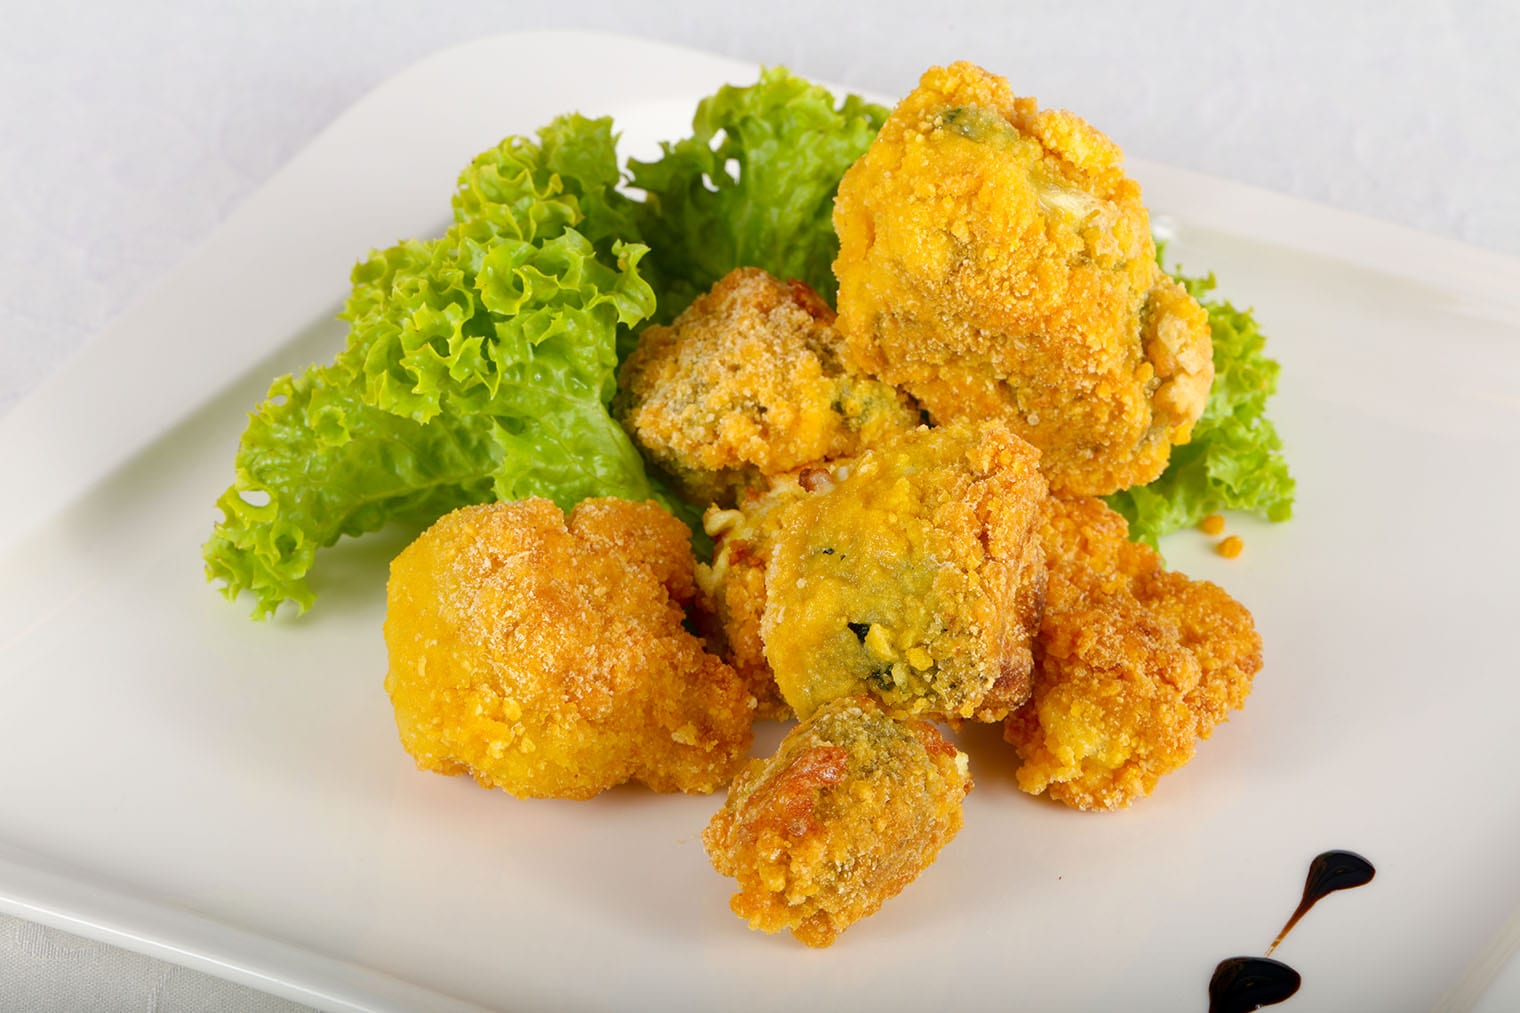 Keto Broccoli Bites with Spicy Mustard